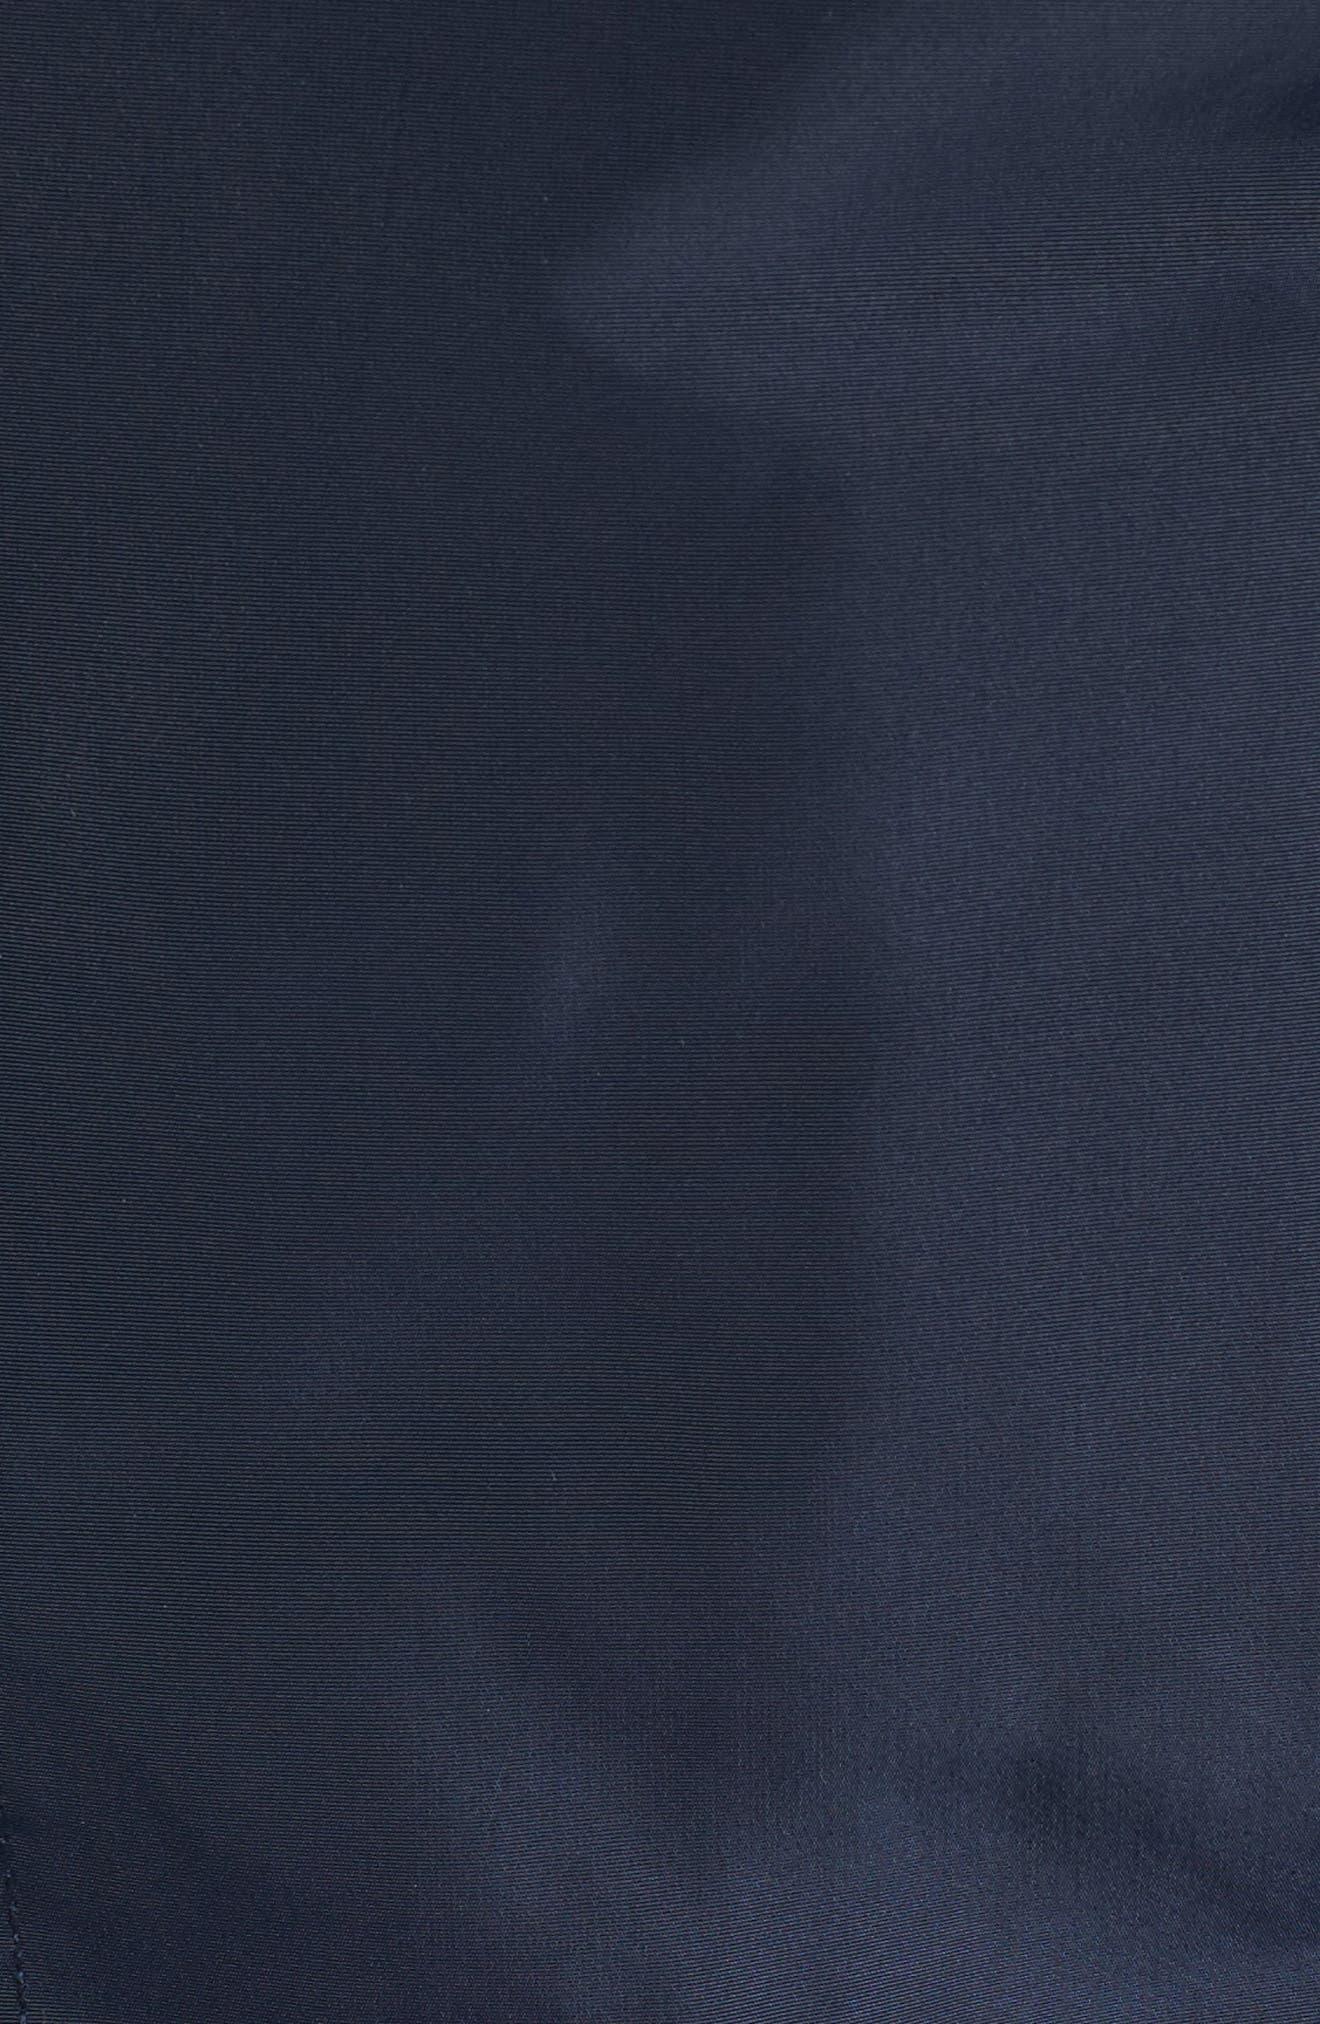 Hooded Windbreaker Jacket,                             Alternate thumbnail 5, color,                             Navy